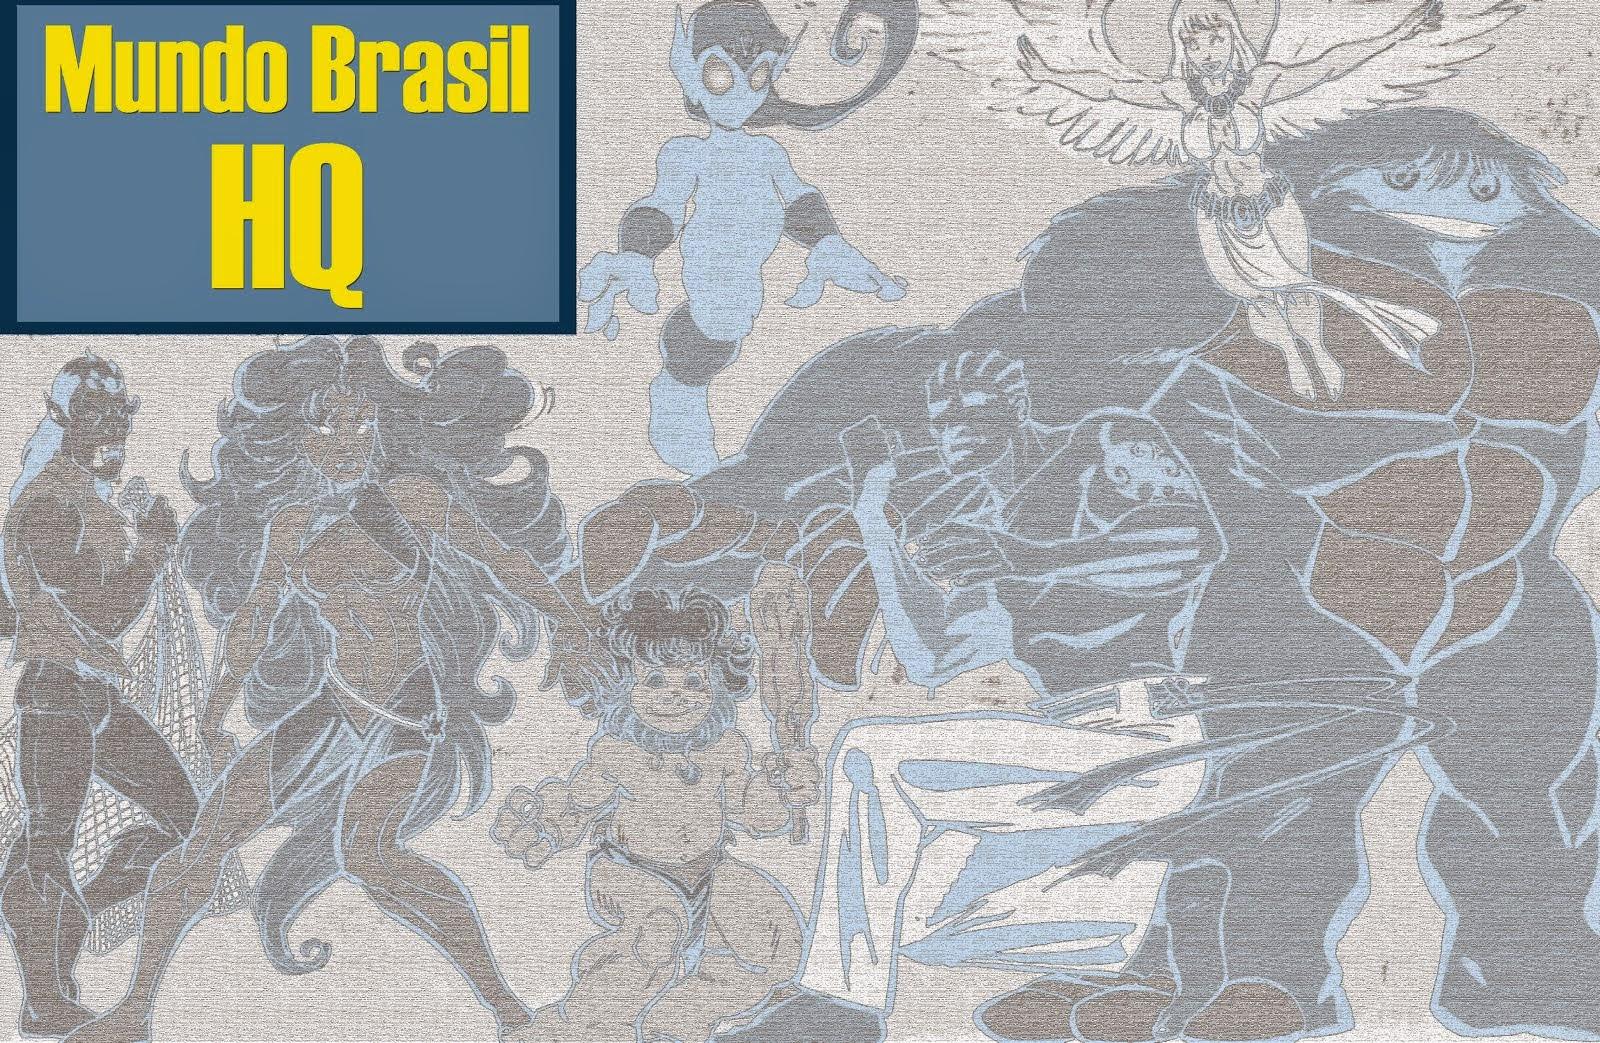 MUNDO BRASIL HQ